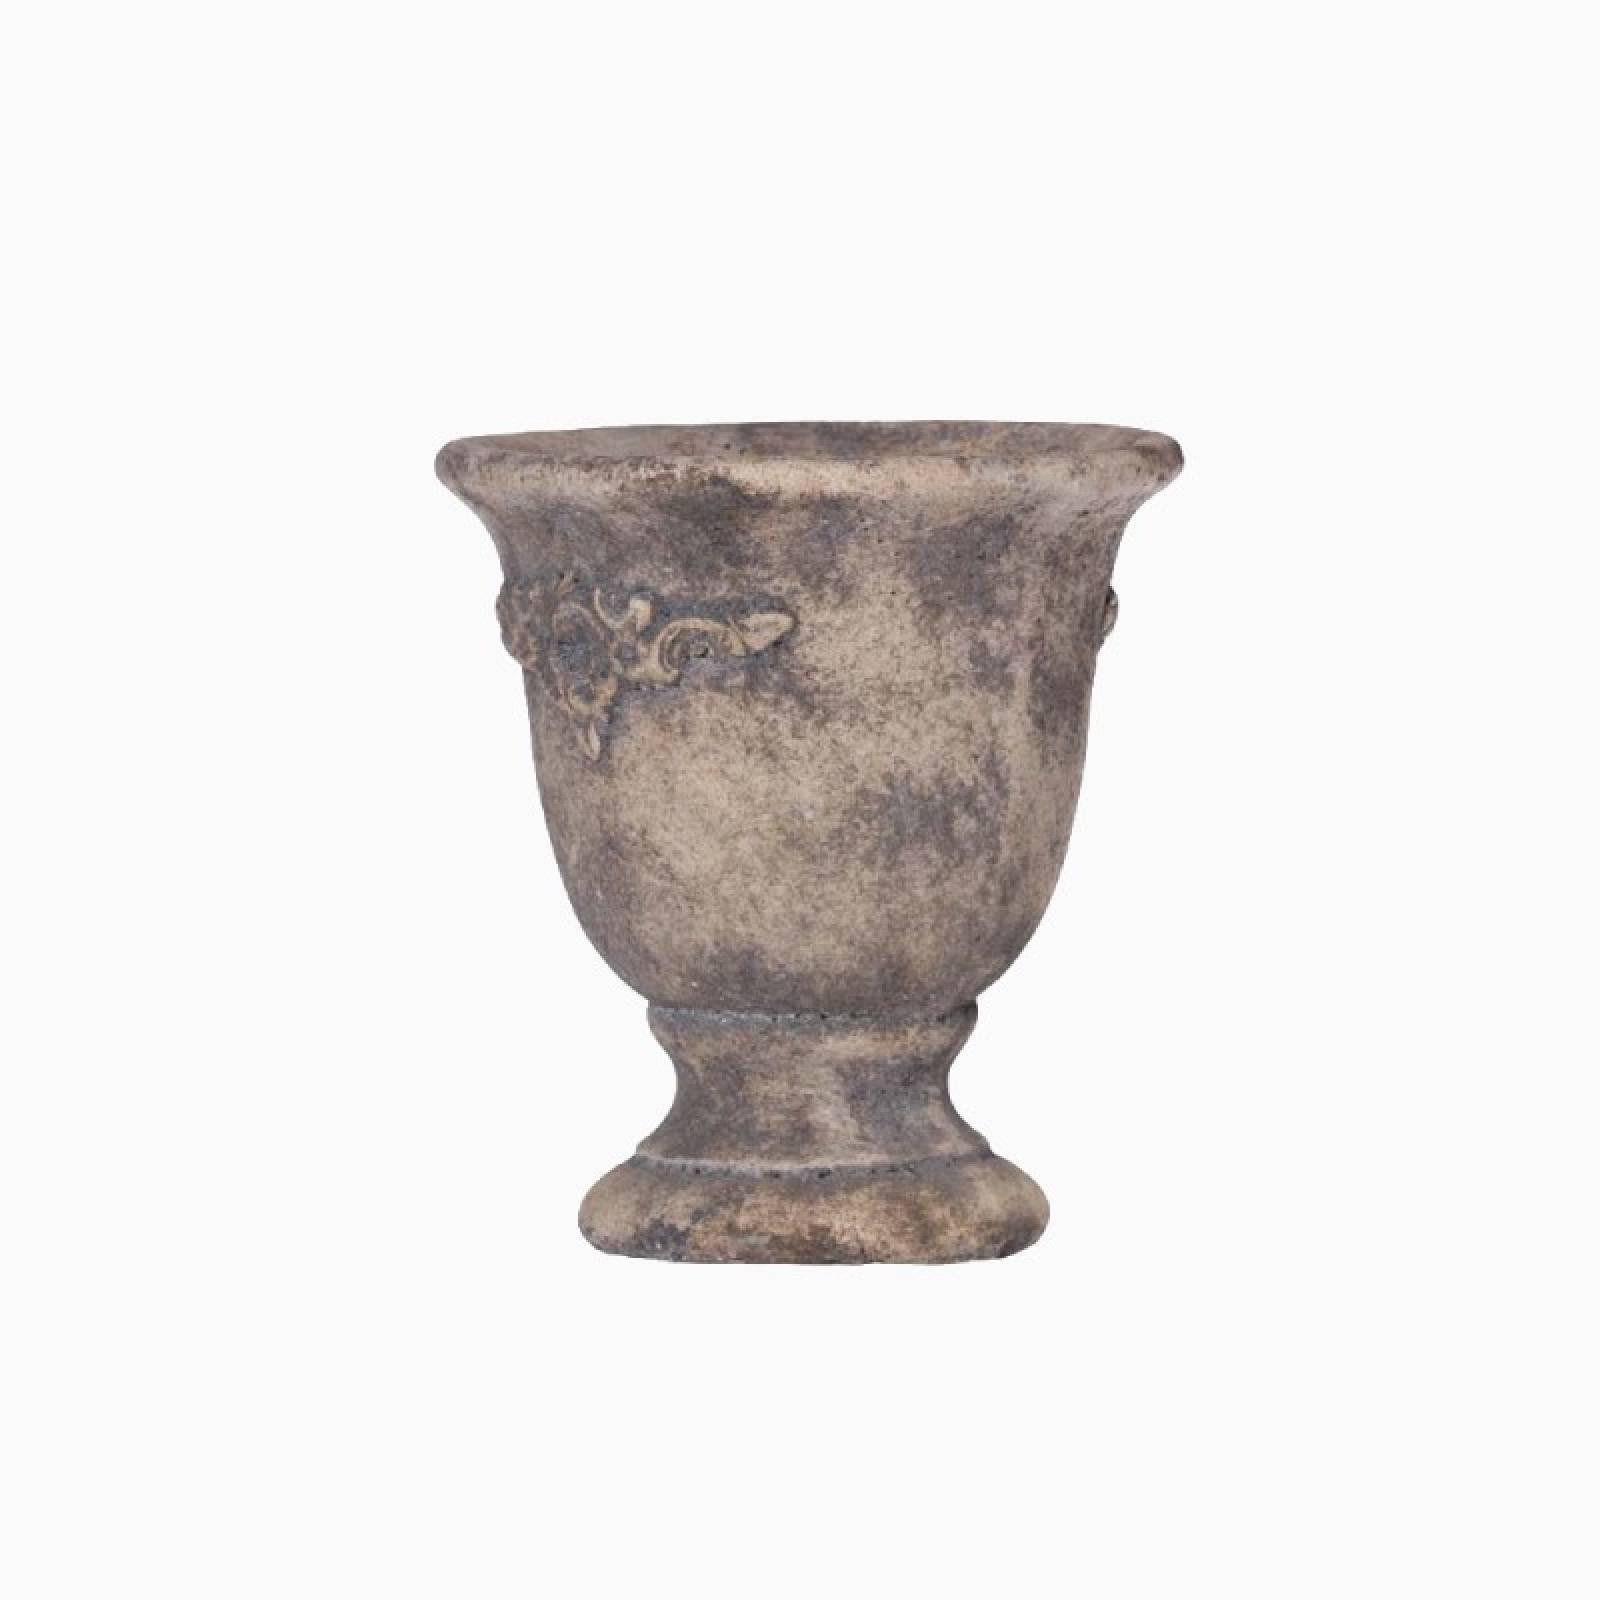 Small Terracotta Urn Shaped Plant Pot